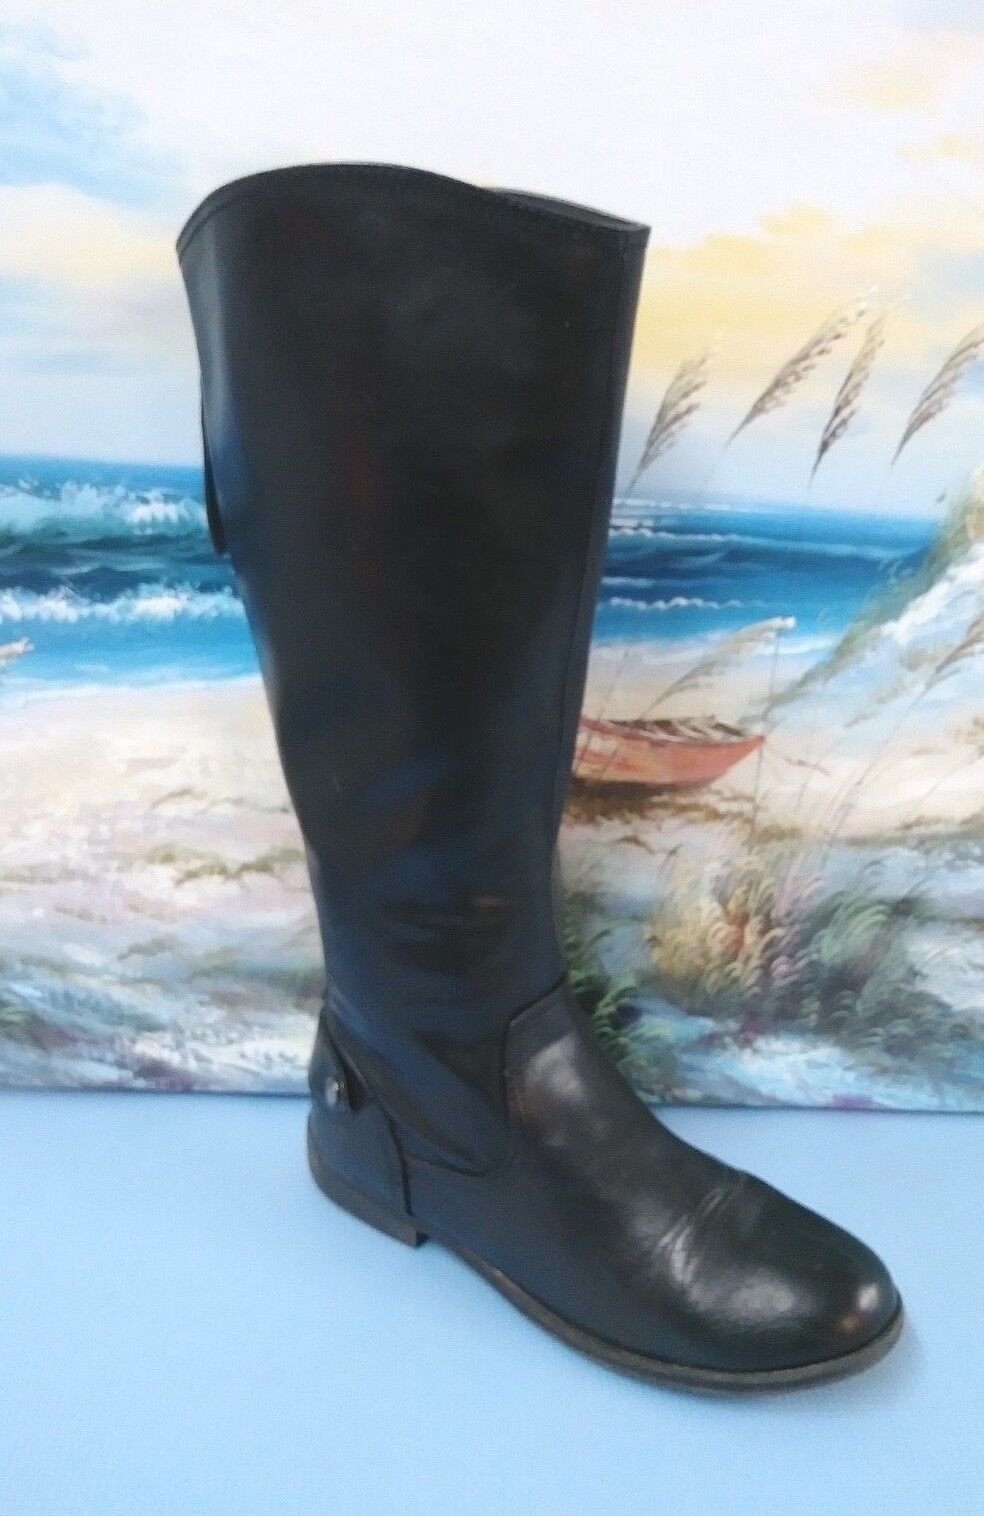 Bongo Trifecta Woman High-Knee Boots Size 9.5 M Style 20295 Black